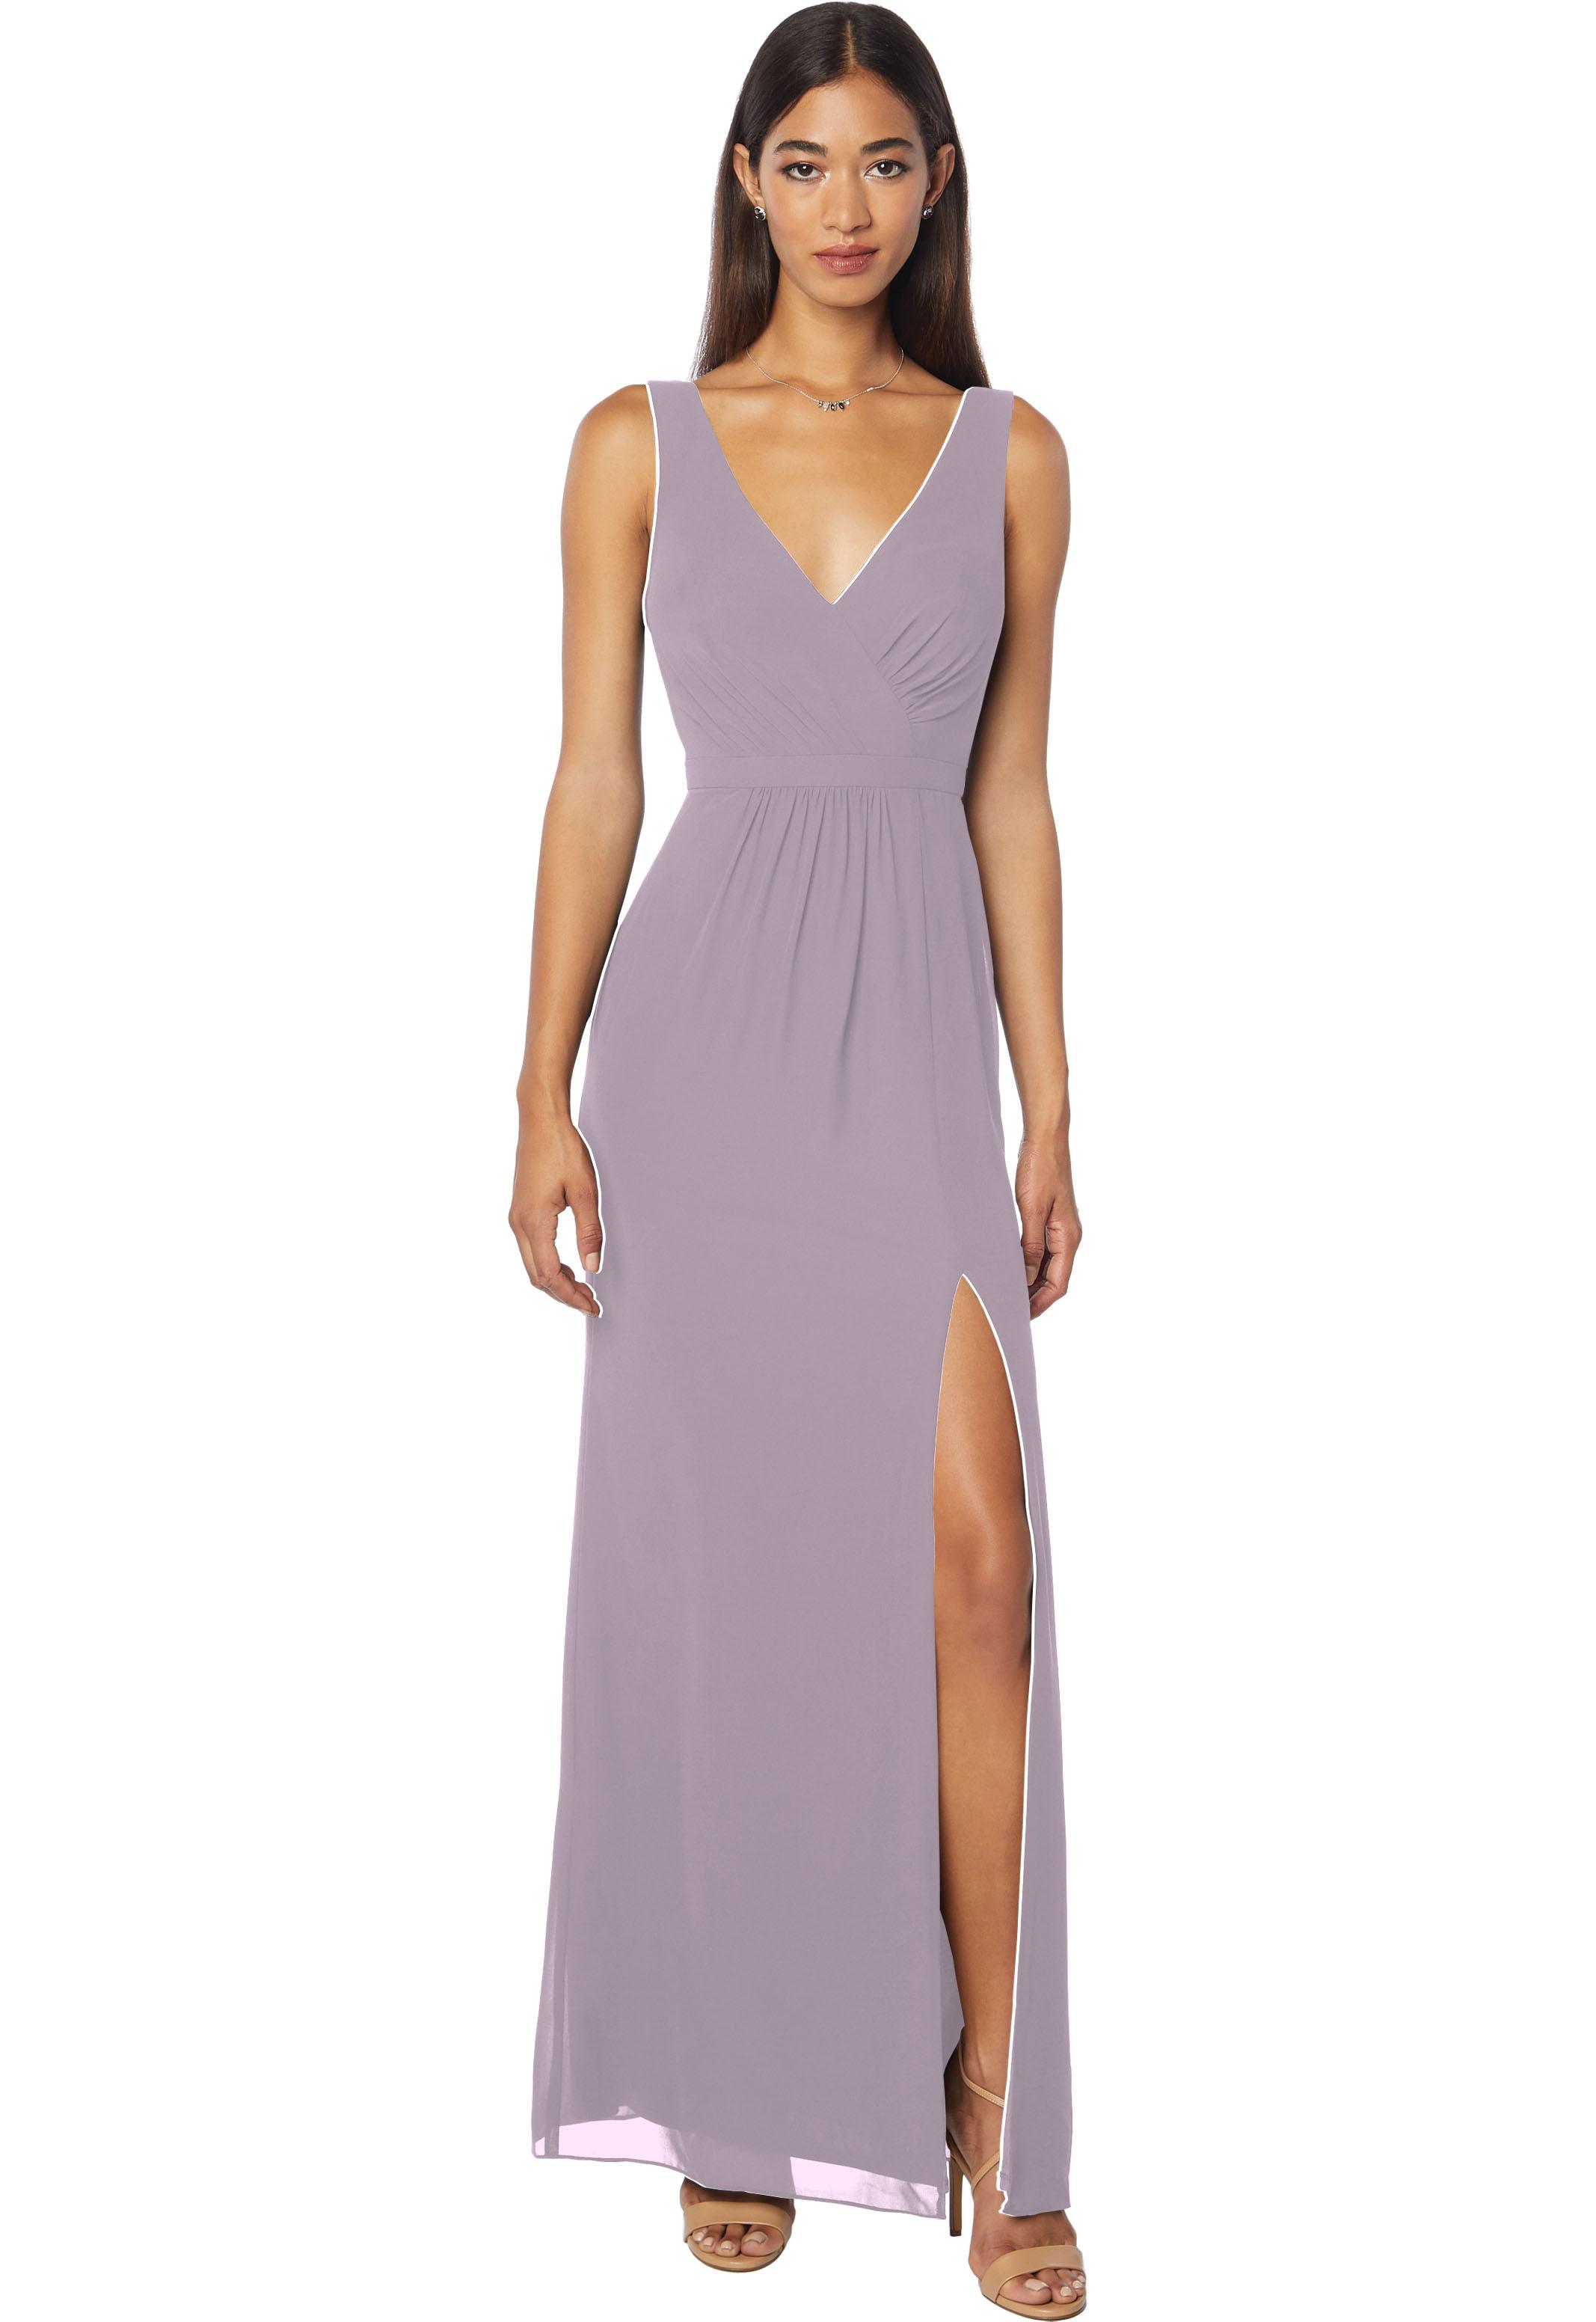 Bill Levkoff HEATHER Chiffon Sleeveless Natural Waist gown, $178.00 Front